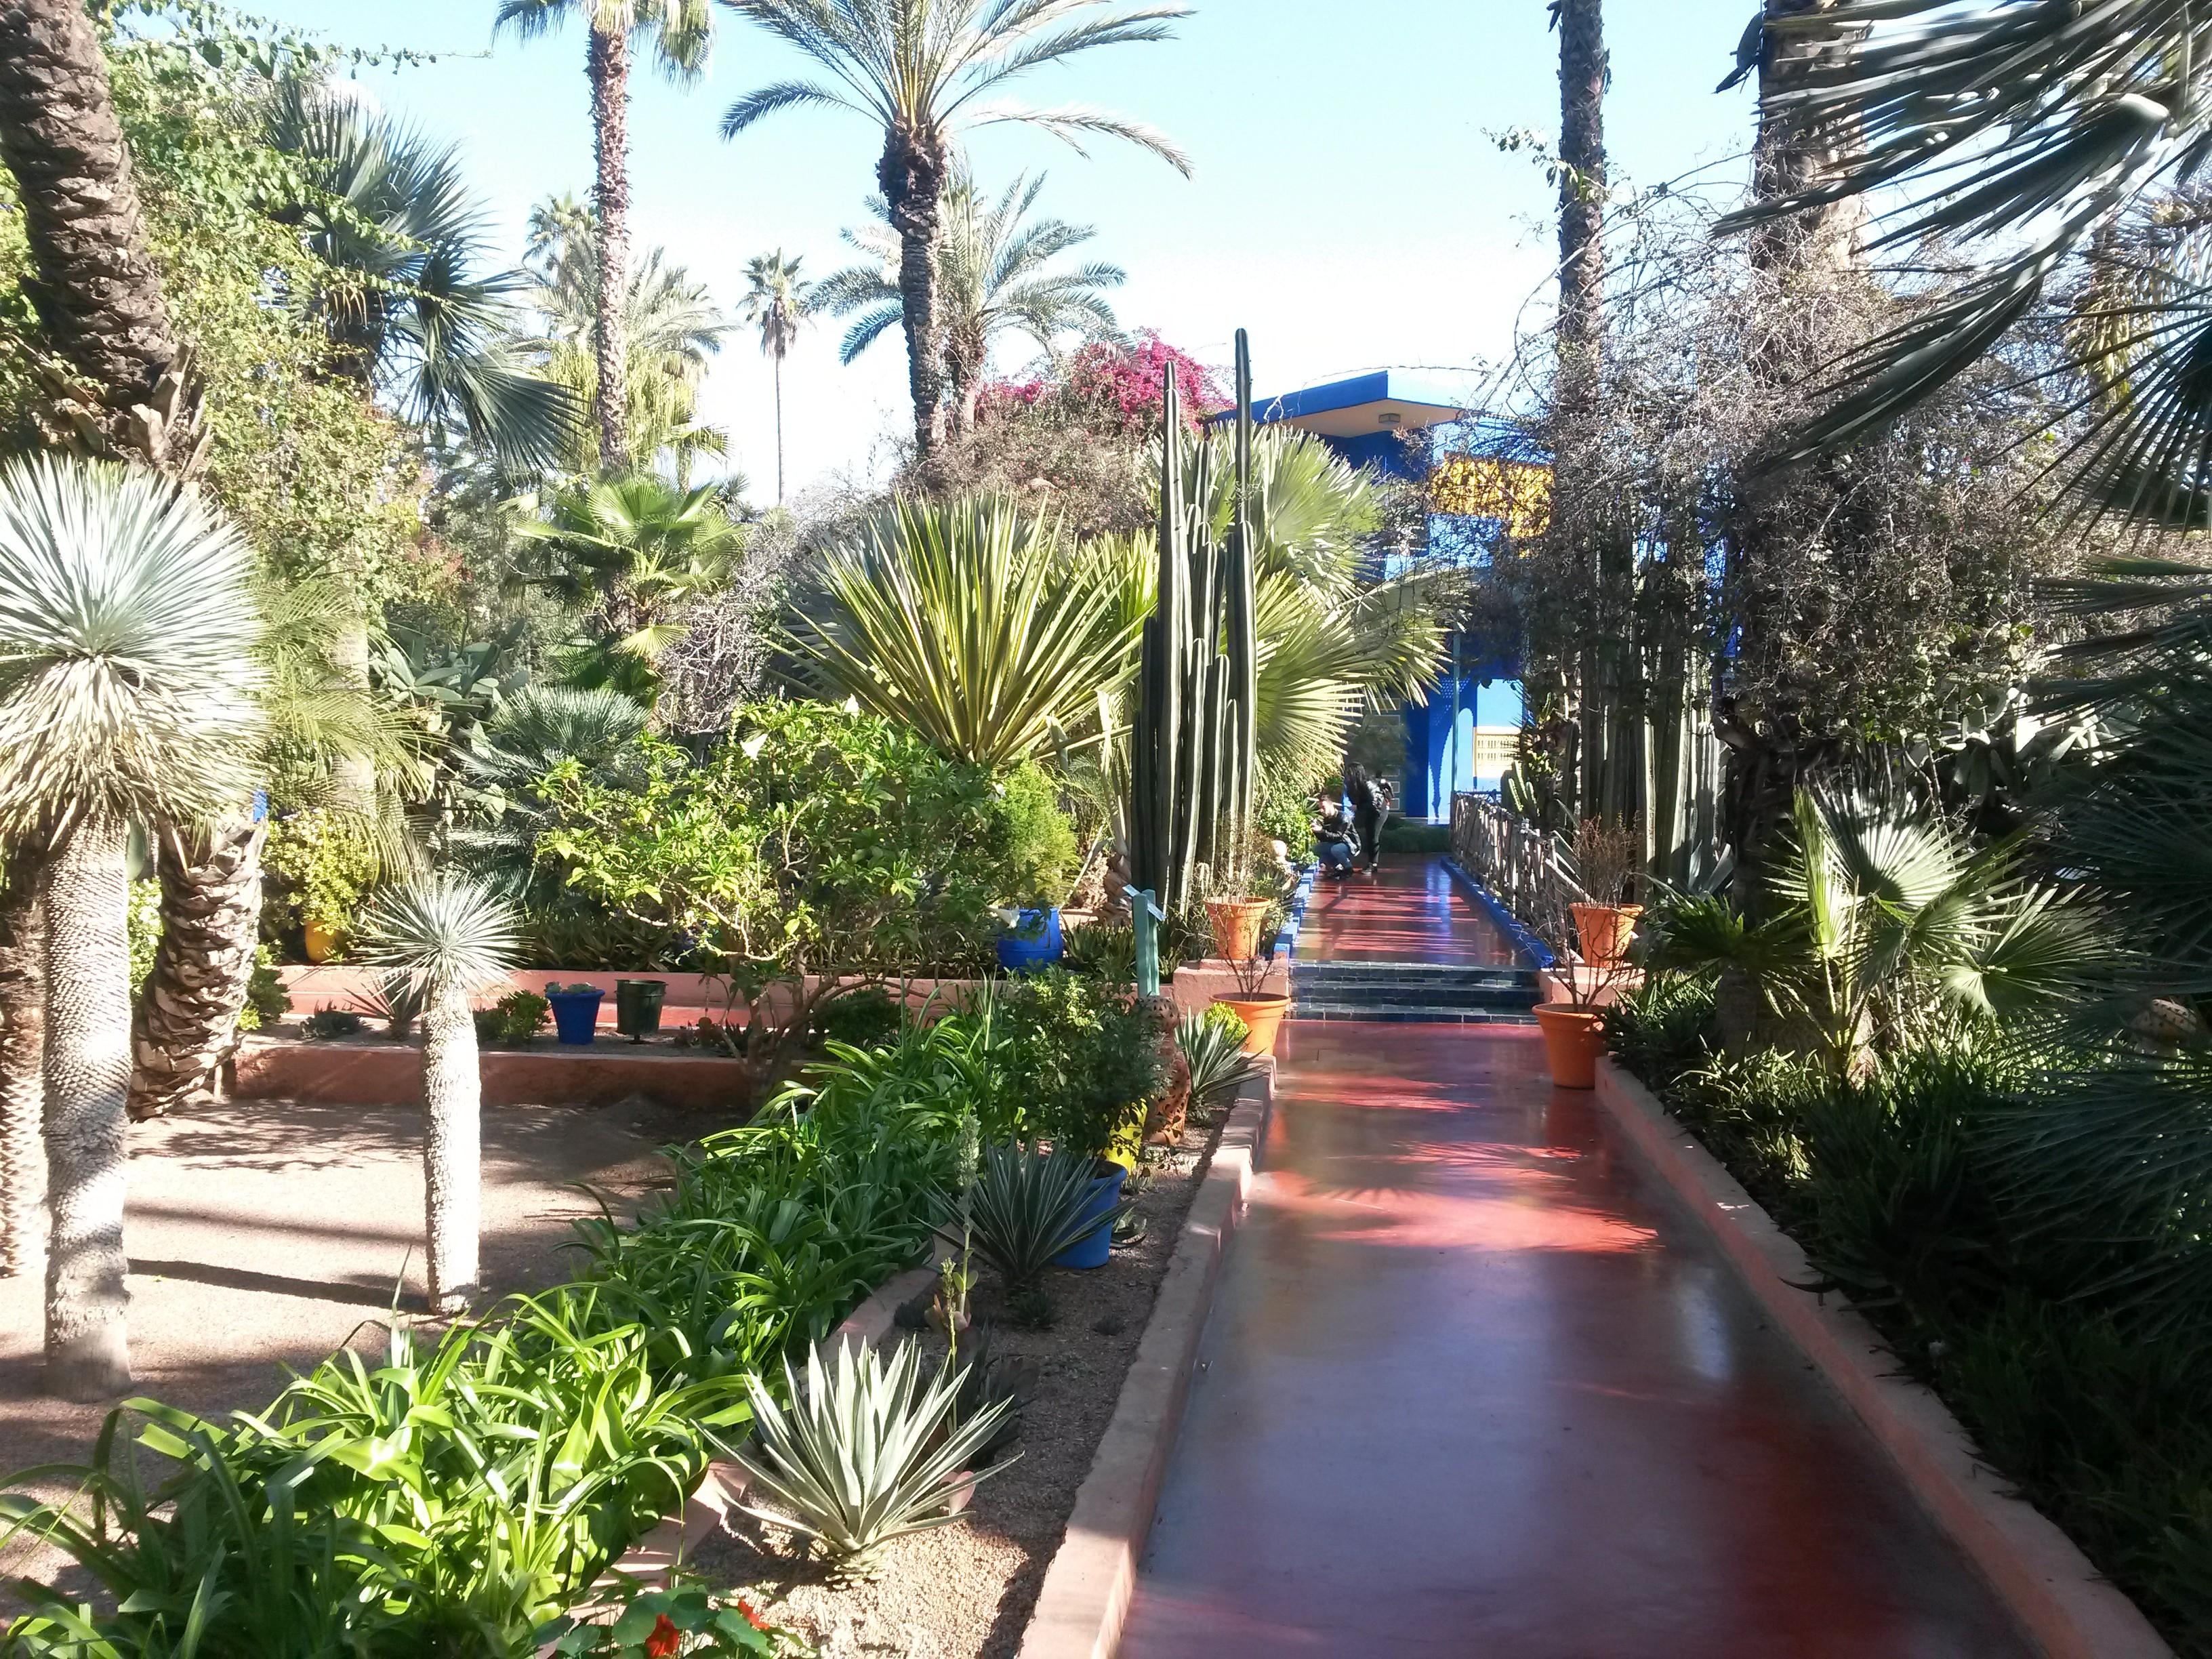 1-semaine-a-marrakech-maroc-jardin-majorelle